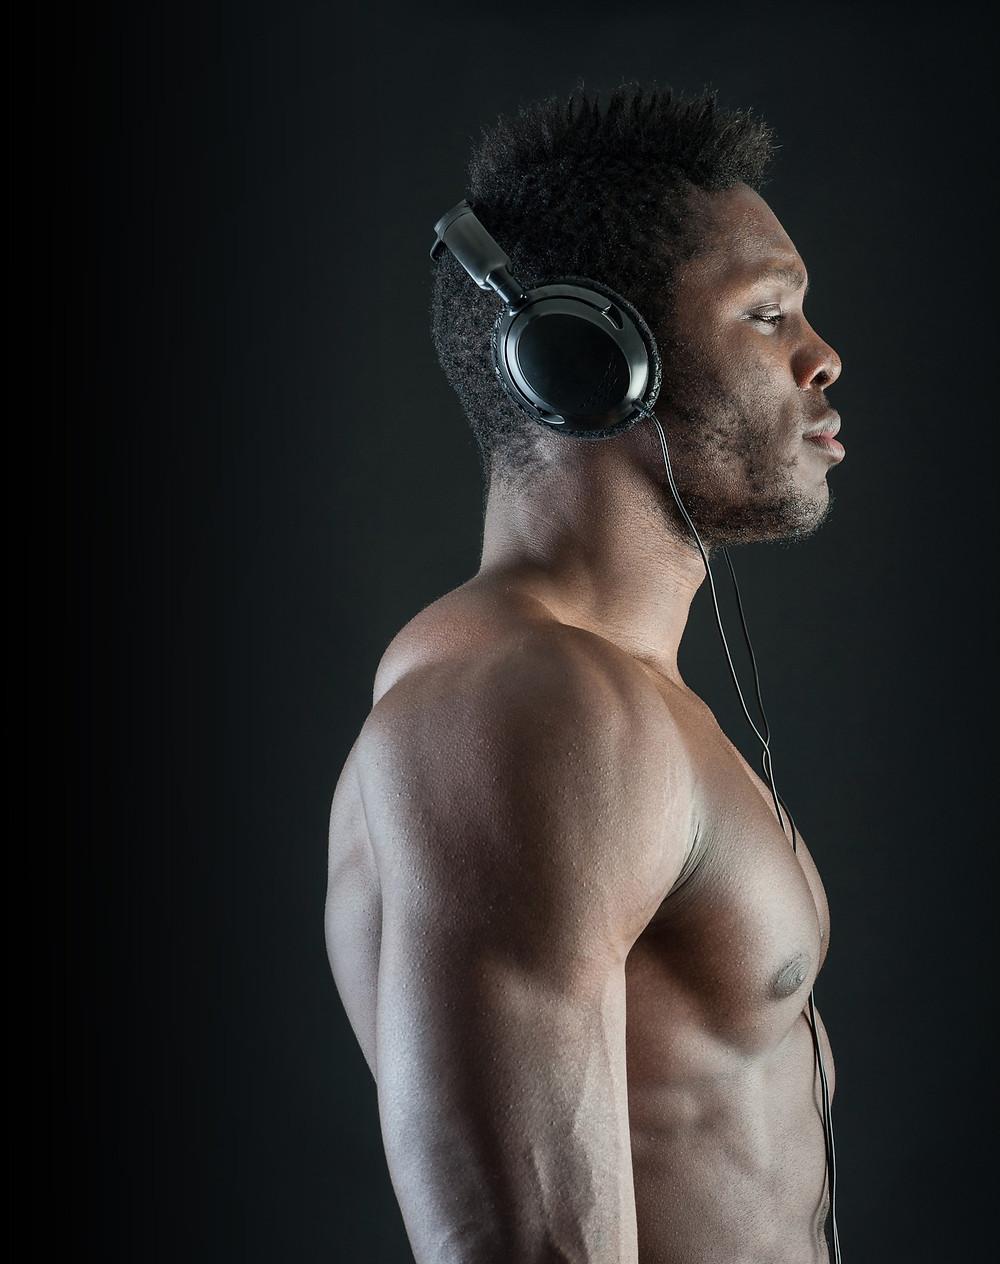 A muscular shirtless black man listening to a workout meditation on head set